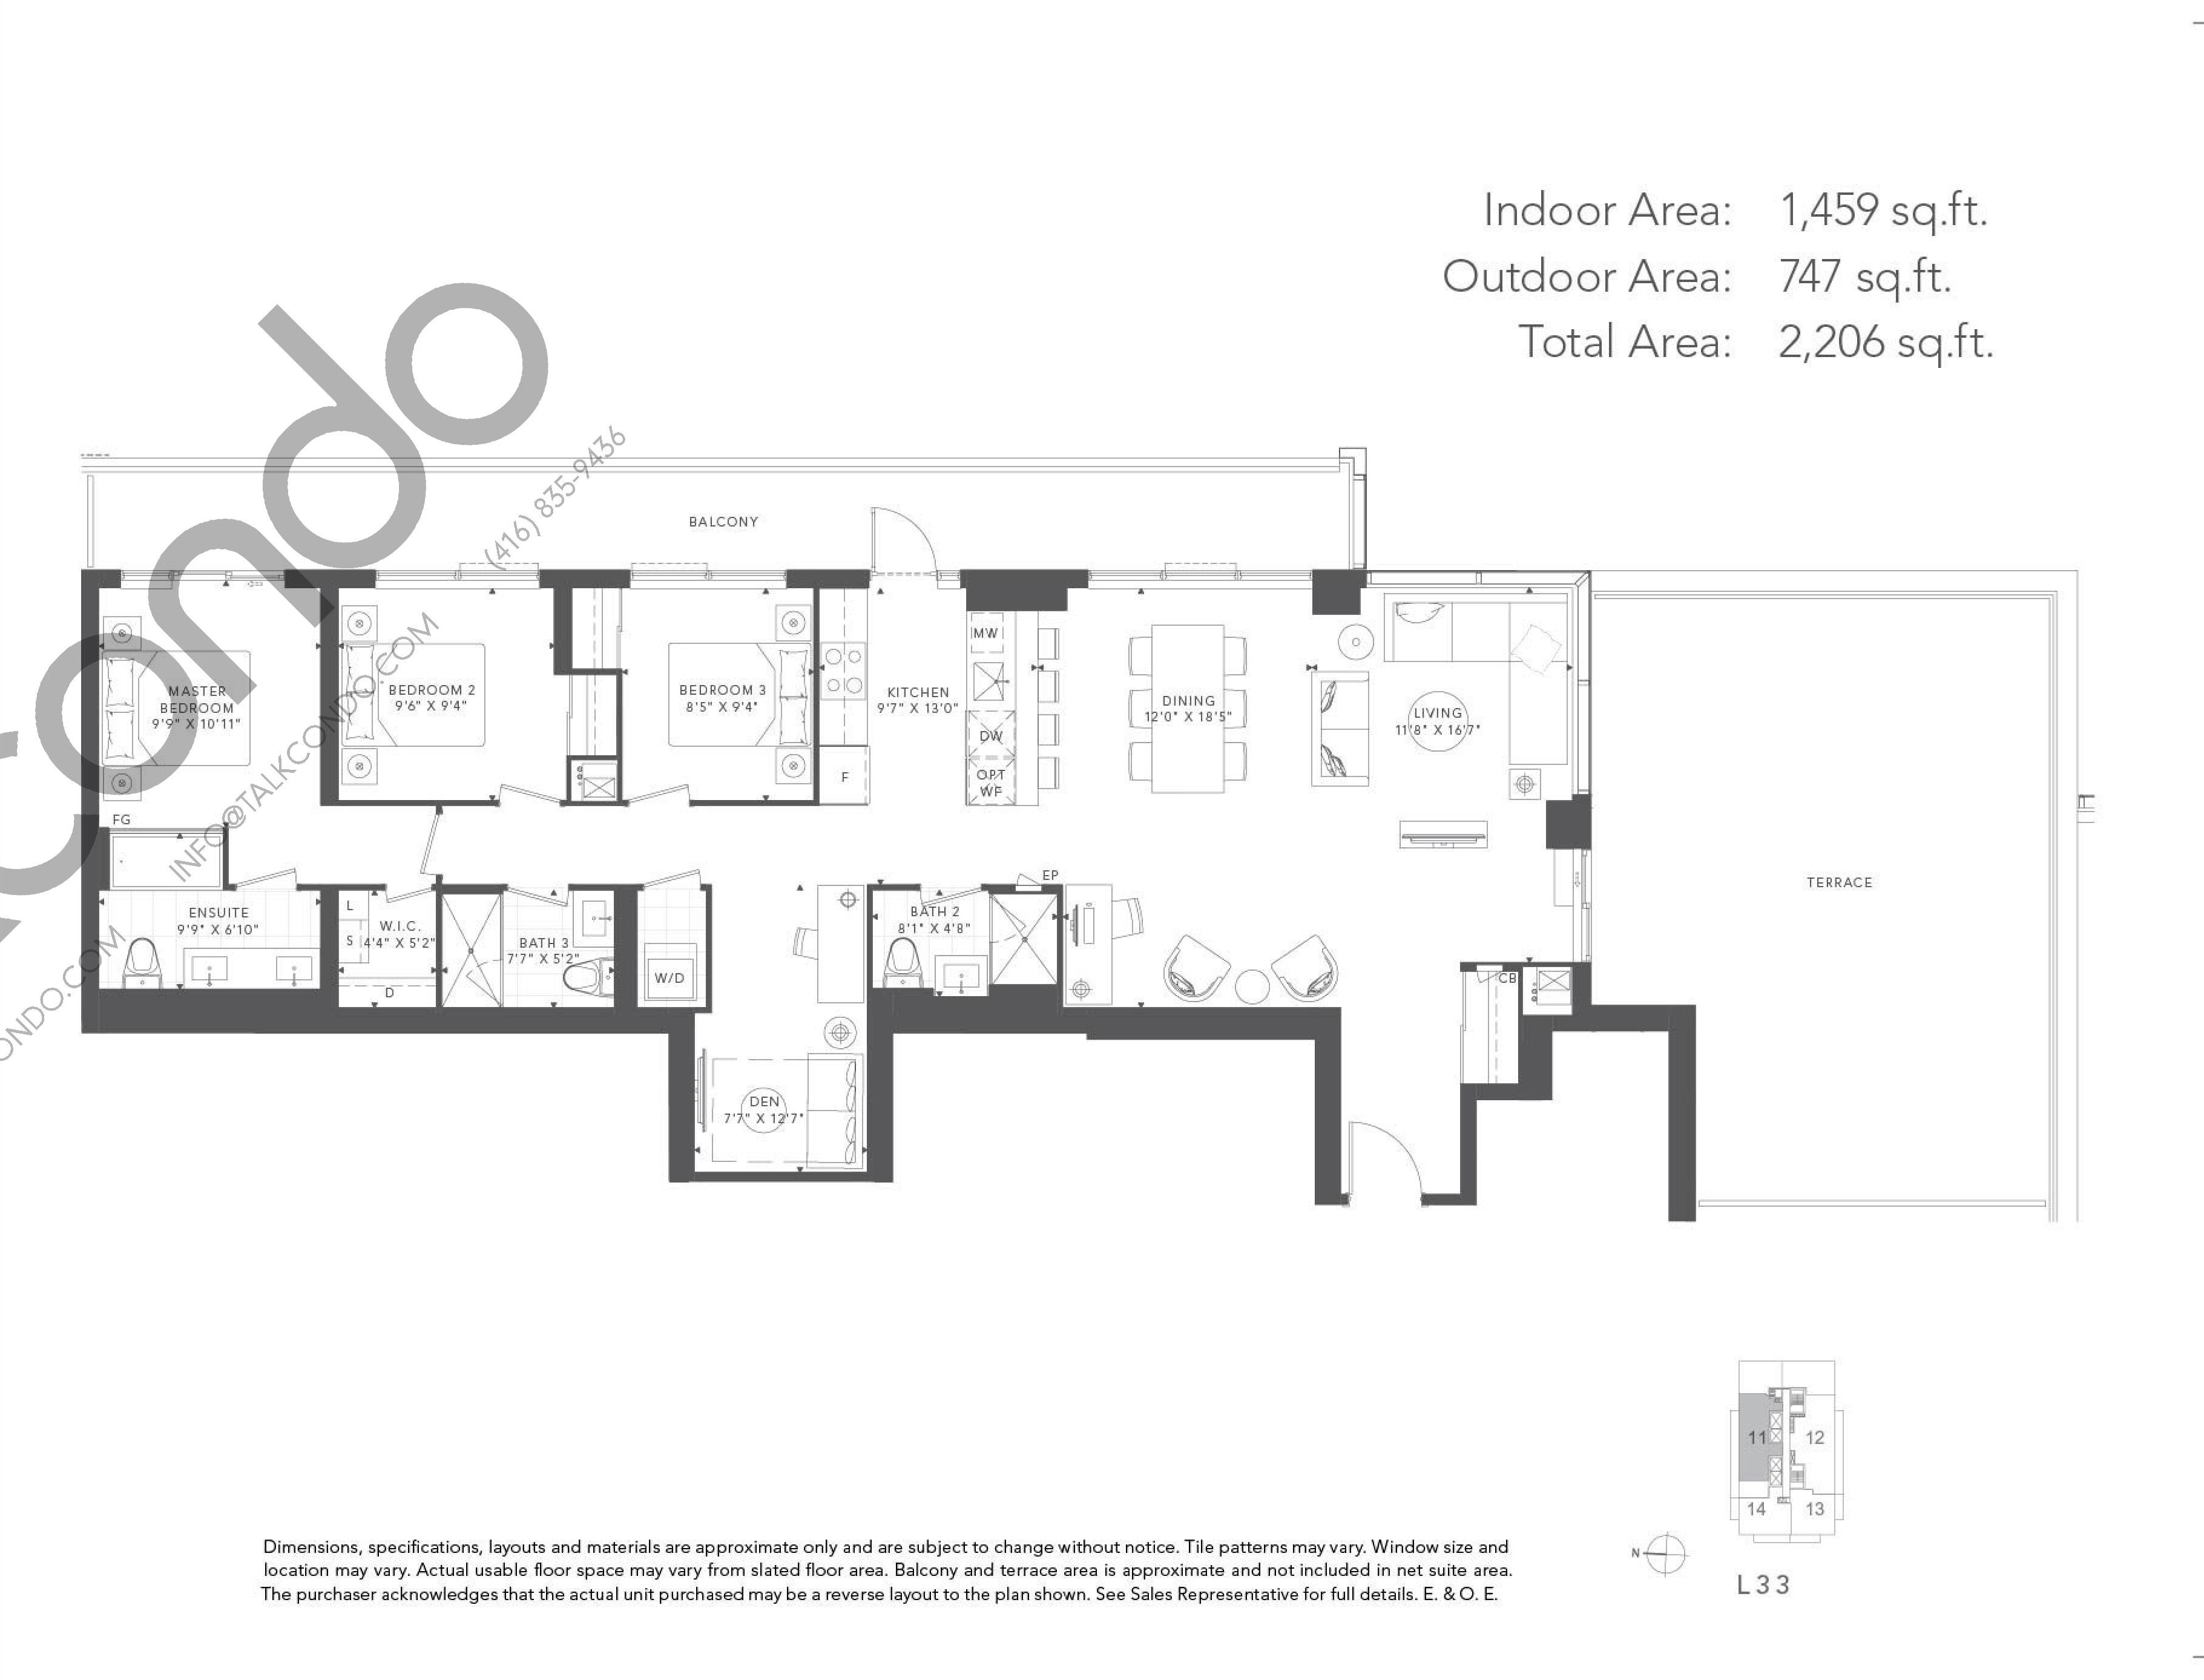 Olive Floor Plan at T1 at M2M Condos - 1459 sq.ft